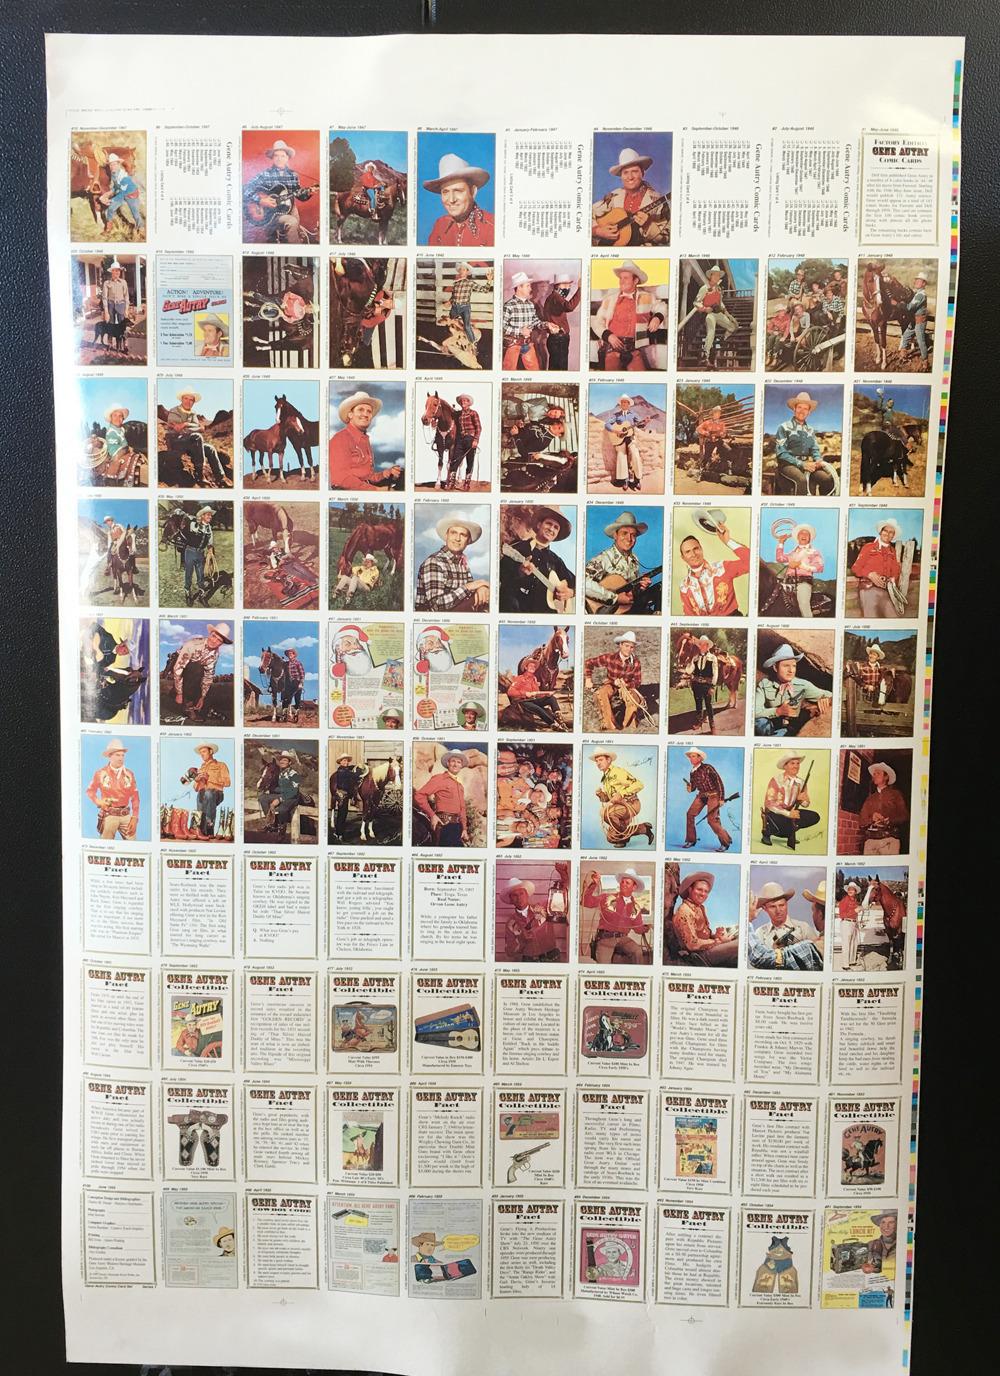 (1) Rare Gene Autry Uncut Poster of 100 Comic Trad